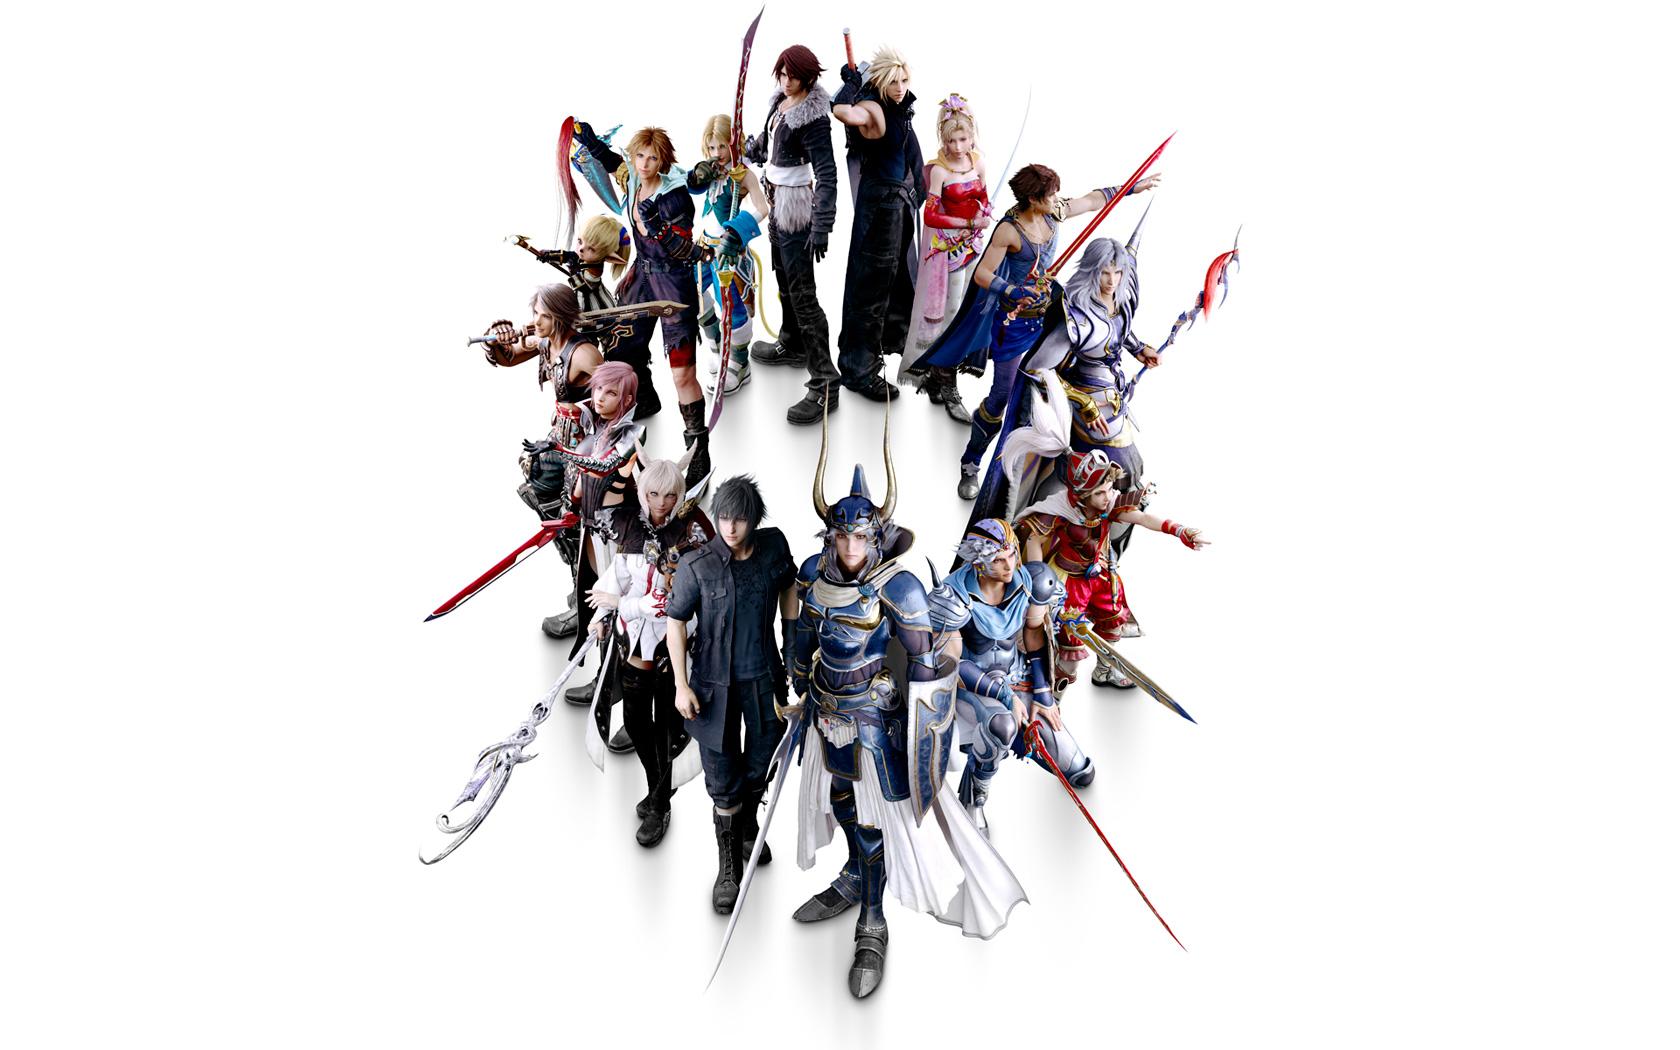 Free Dissidia Final Fantasy NT Wallpaper in 1680x1050